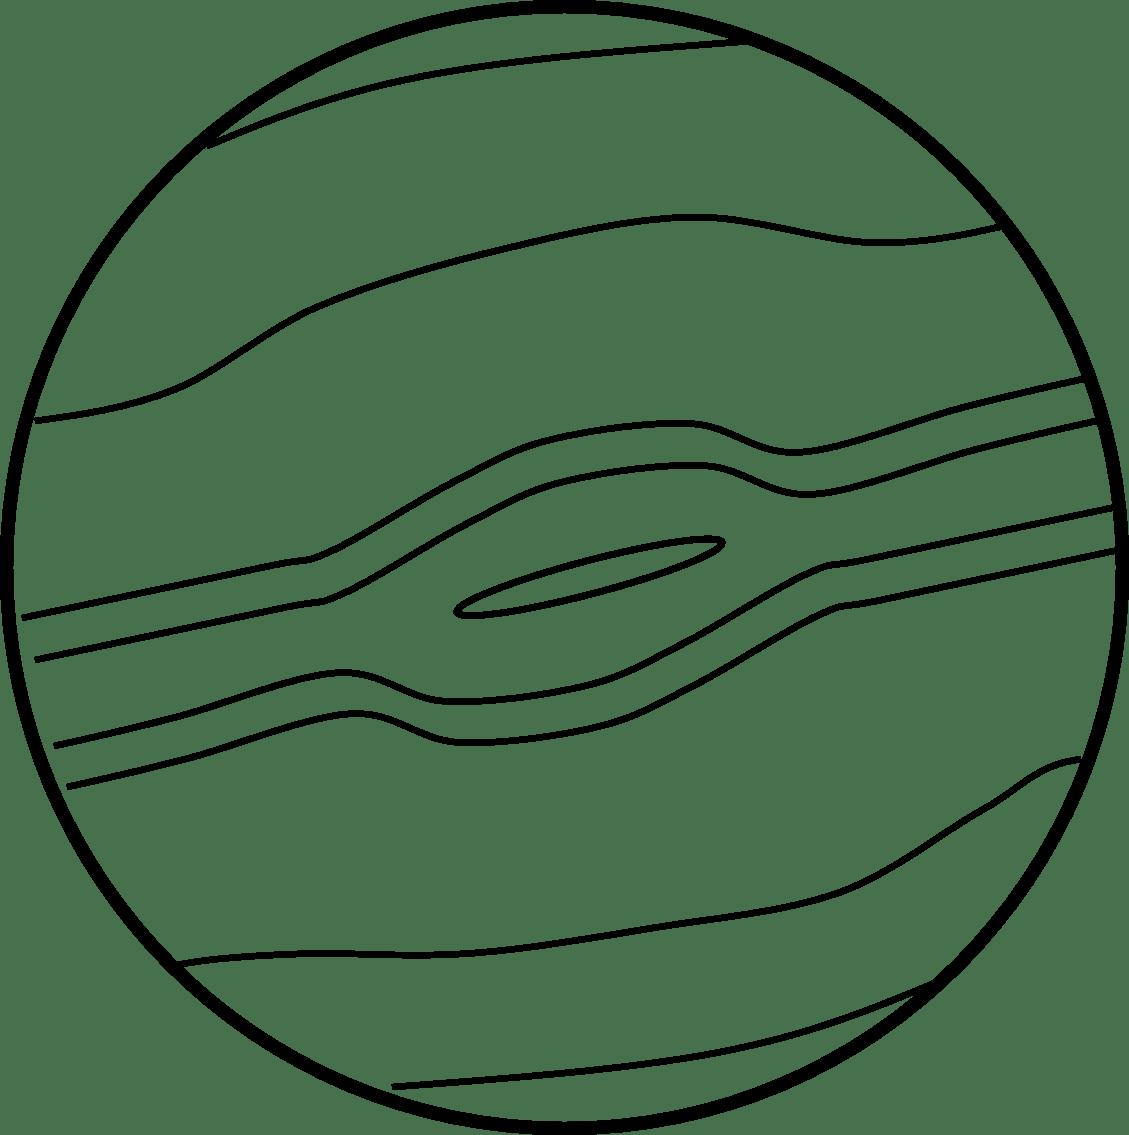 Planet Clip Art Free Clipart Images 3 4